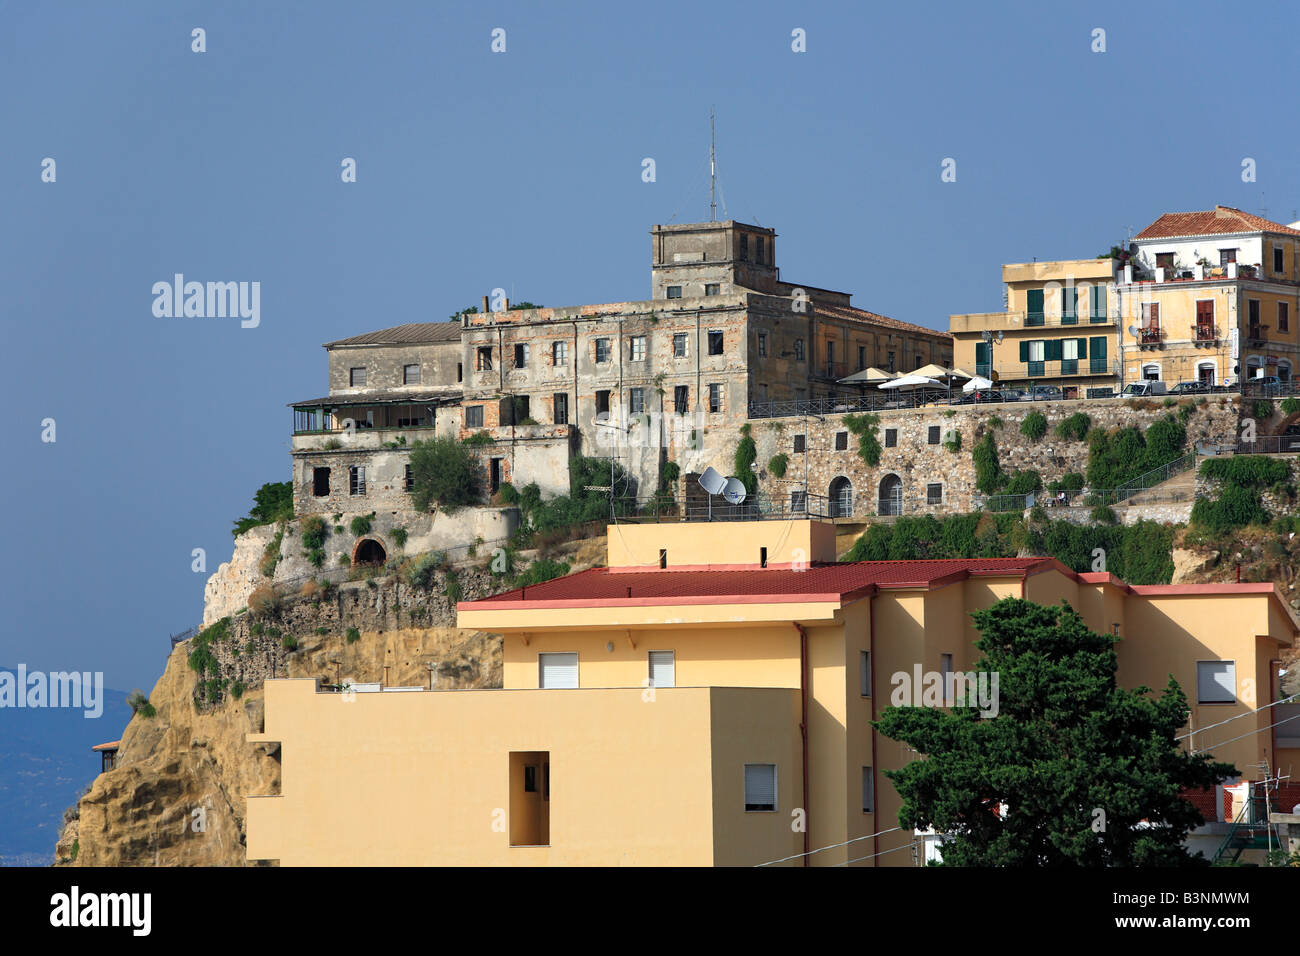 Stadtpanorama mit Castello Aragonese in Pizzo, Kalabrien, Italien Stock Photo